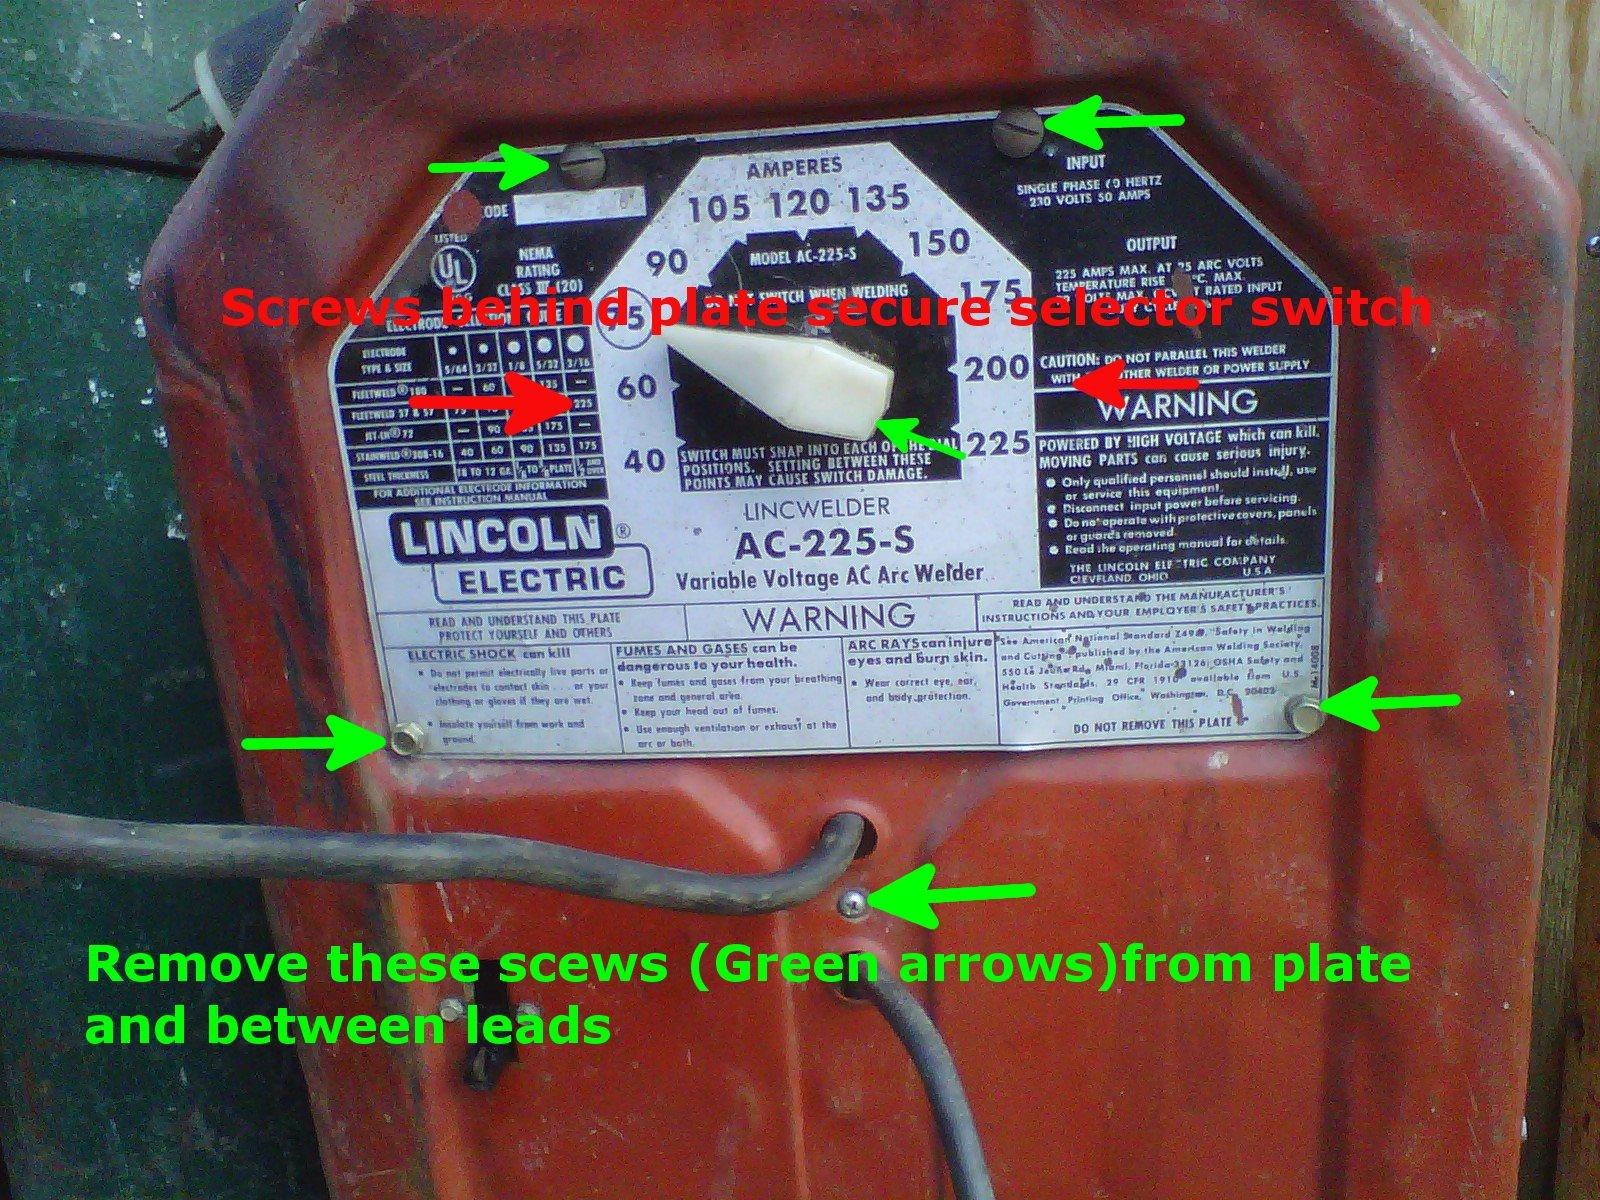 Lincoln Ac 225 Dc Welder Wiring Diagram Wiring Diagram Fold News A Fold News A Valhallarestaurant It